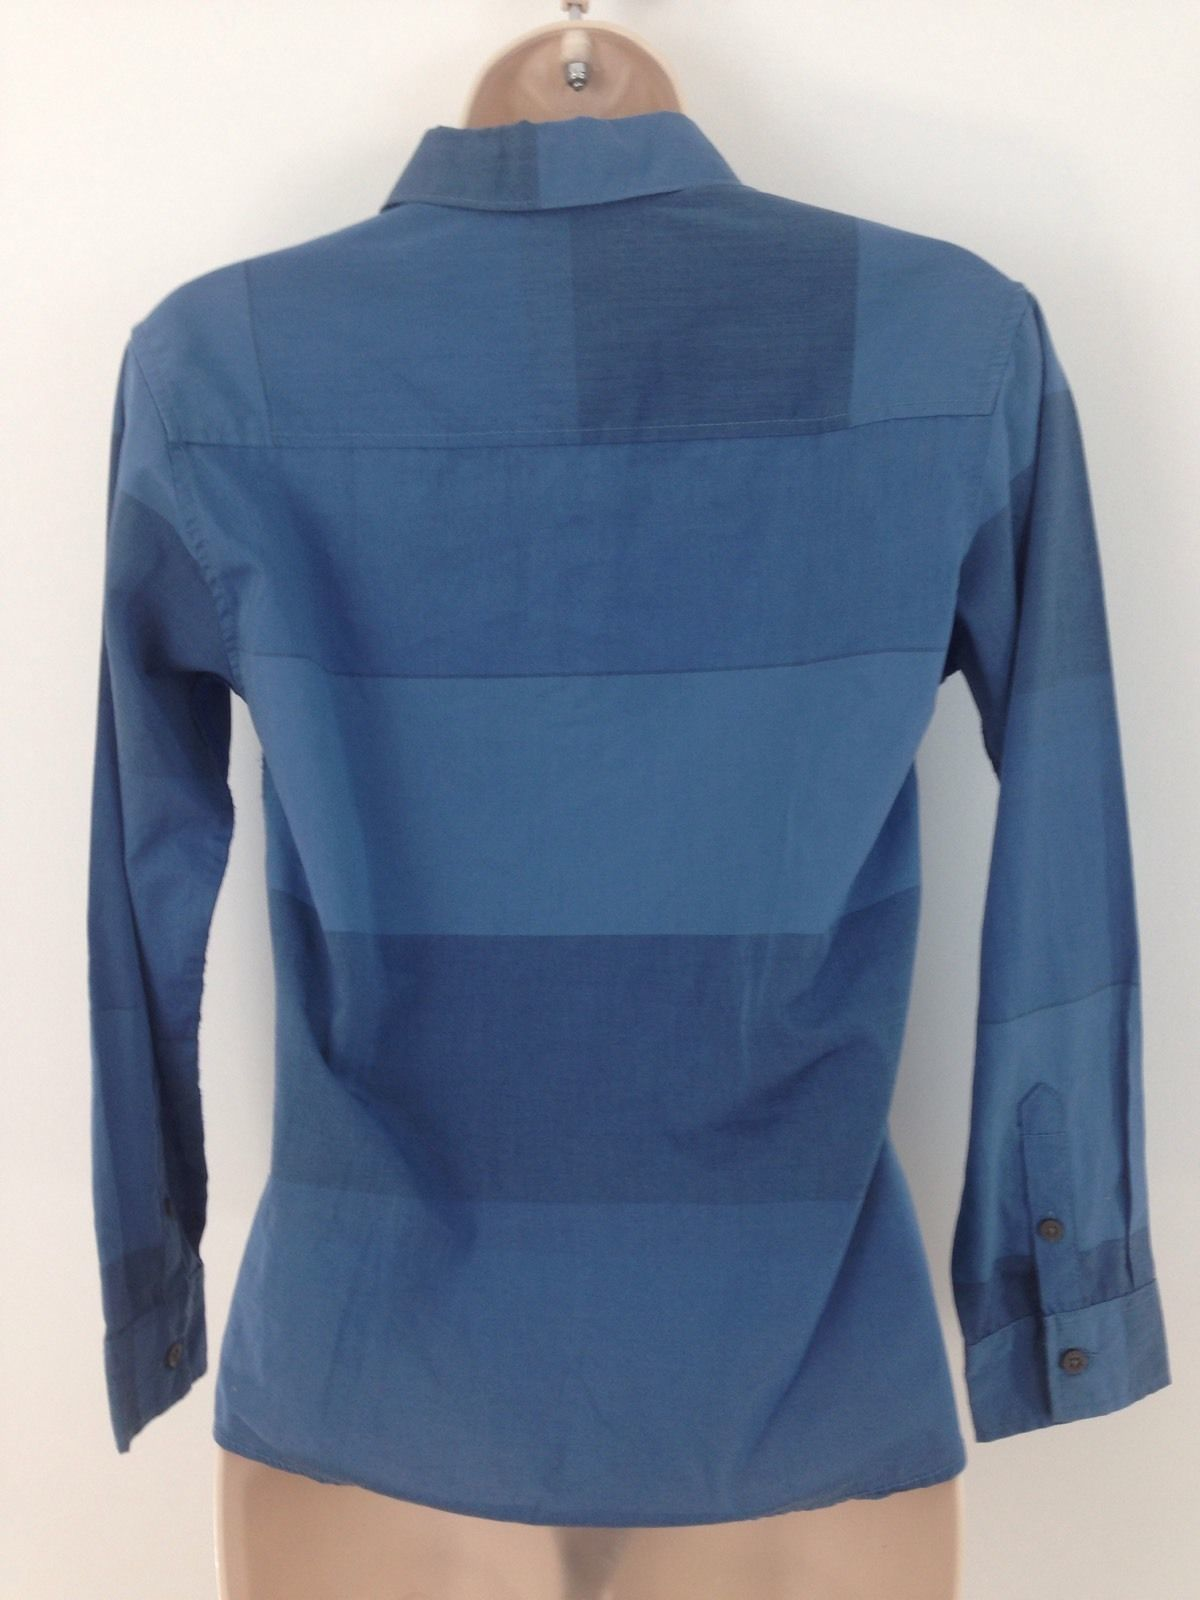 Calvin Klein Jeans Womens M Blue Big Stripe Button Front Top Blouse Shirt